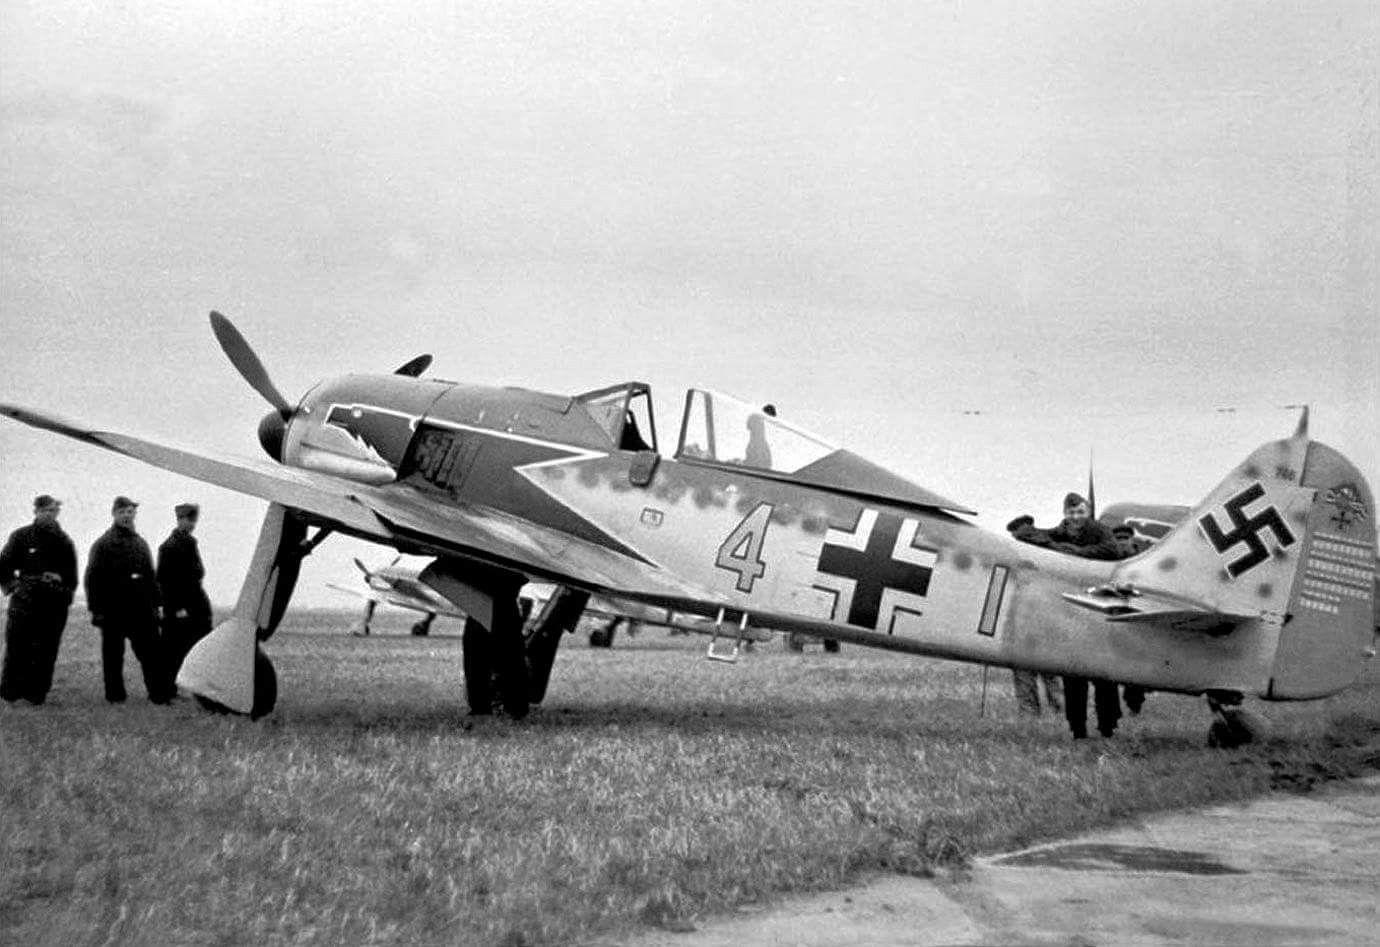 Focke Wulf Fw-190D | Page 4 | Aircraft of World War II